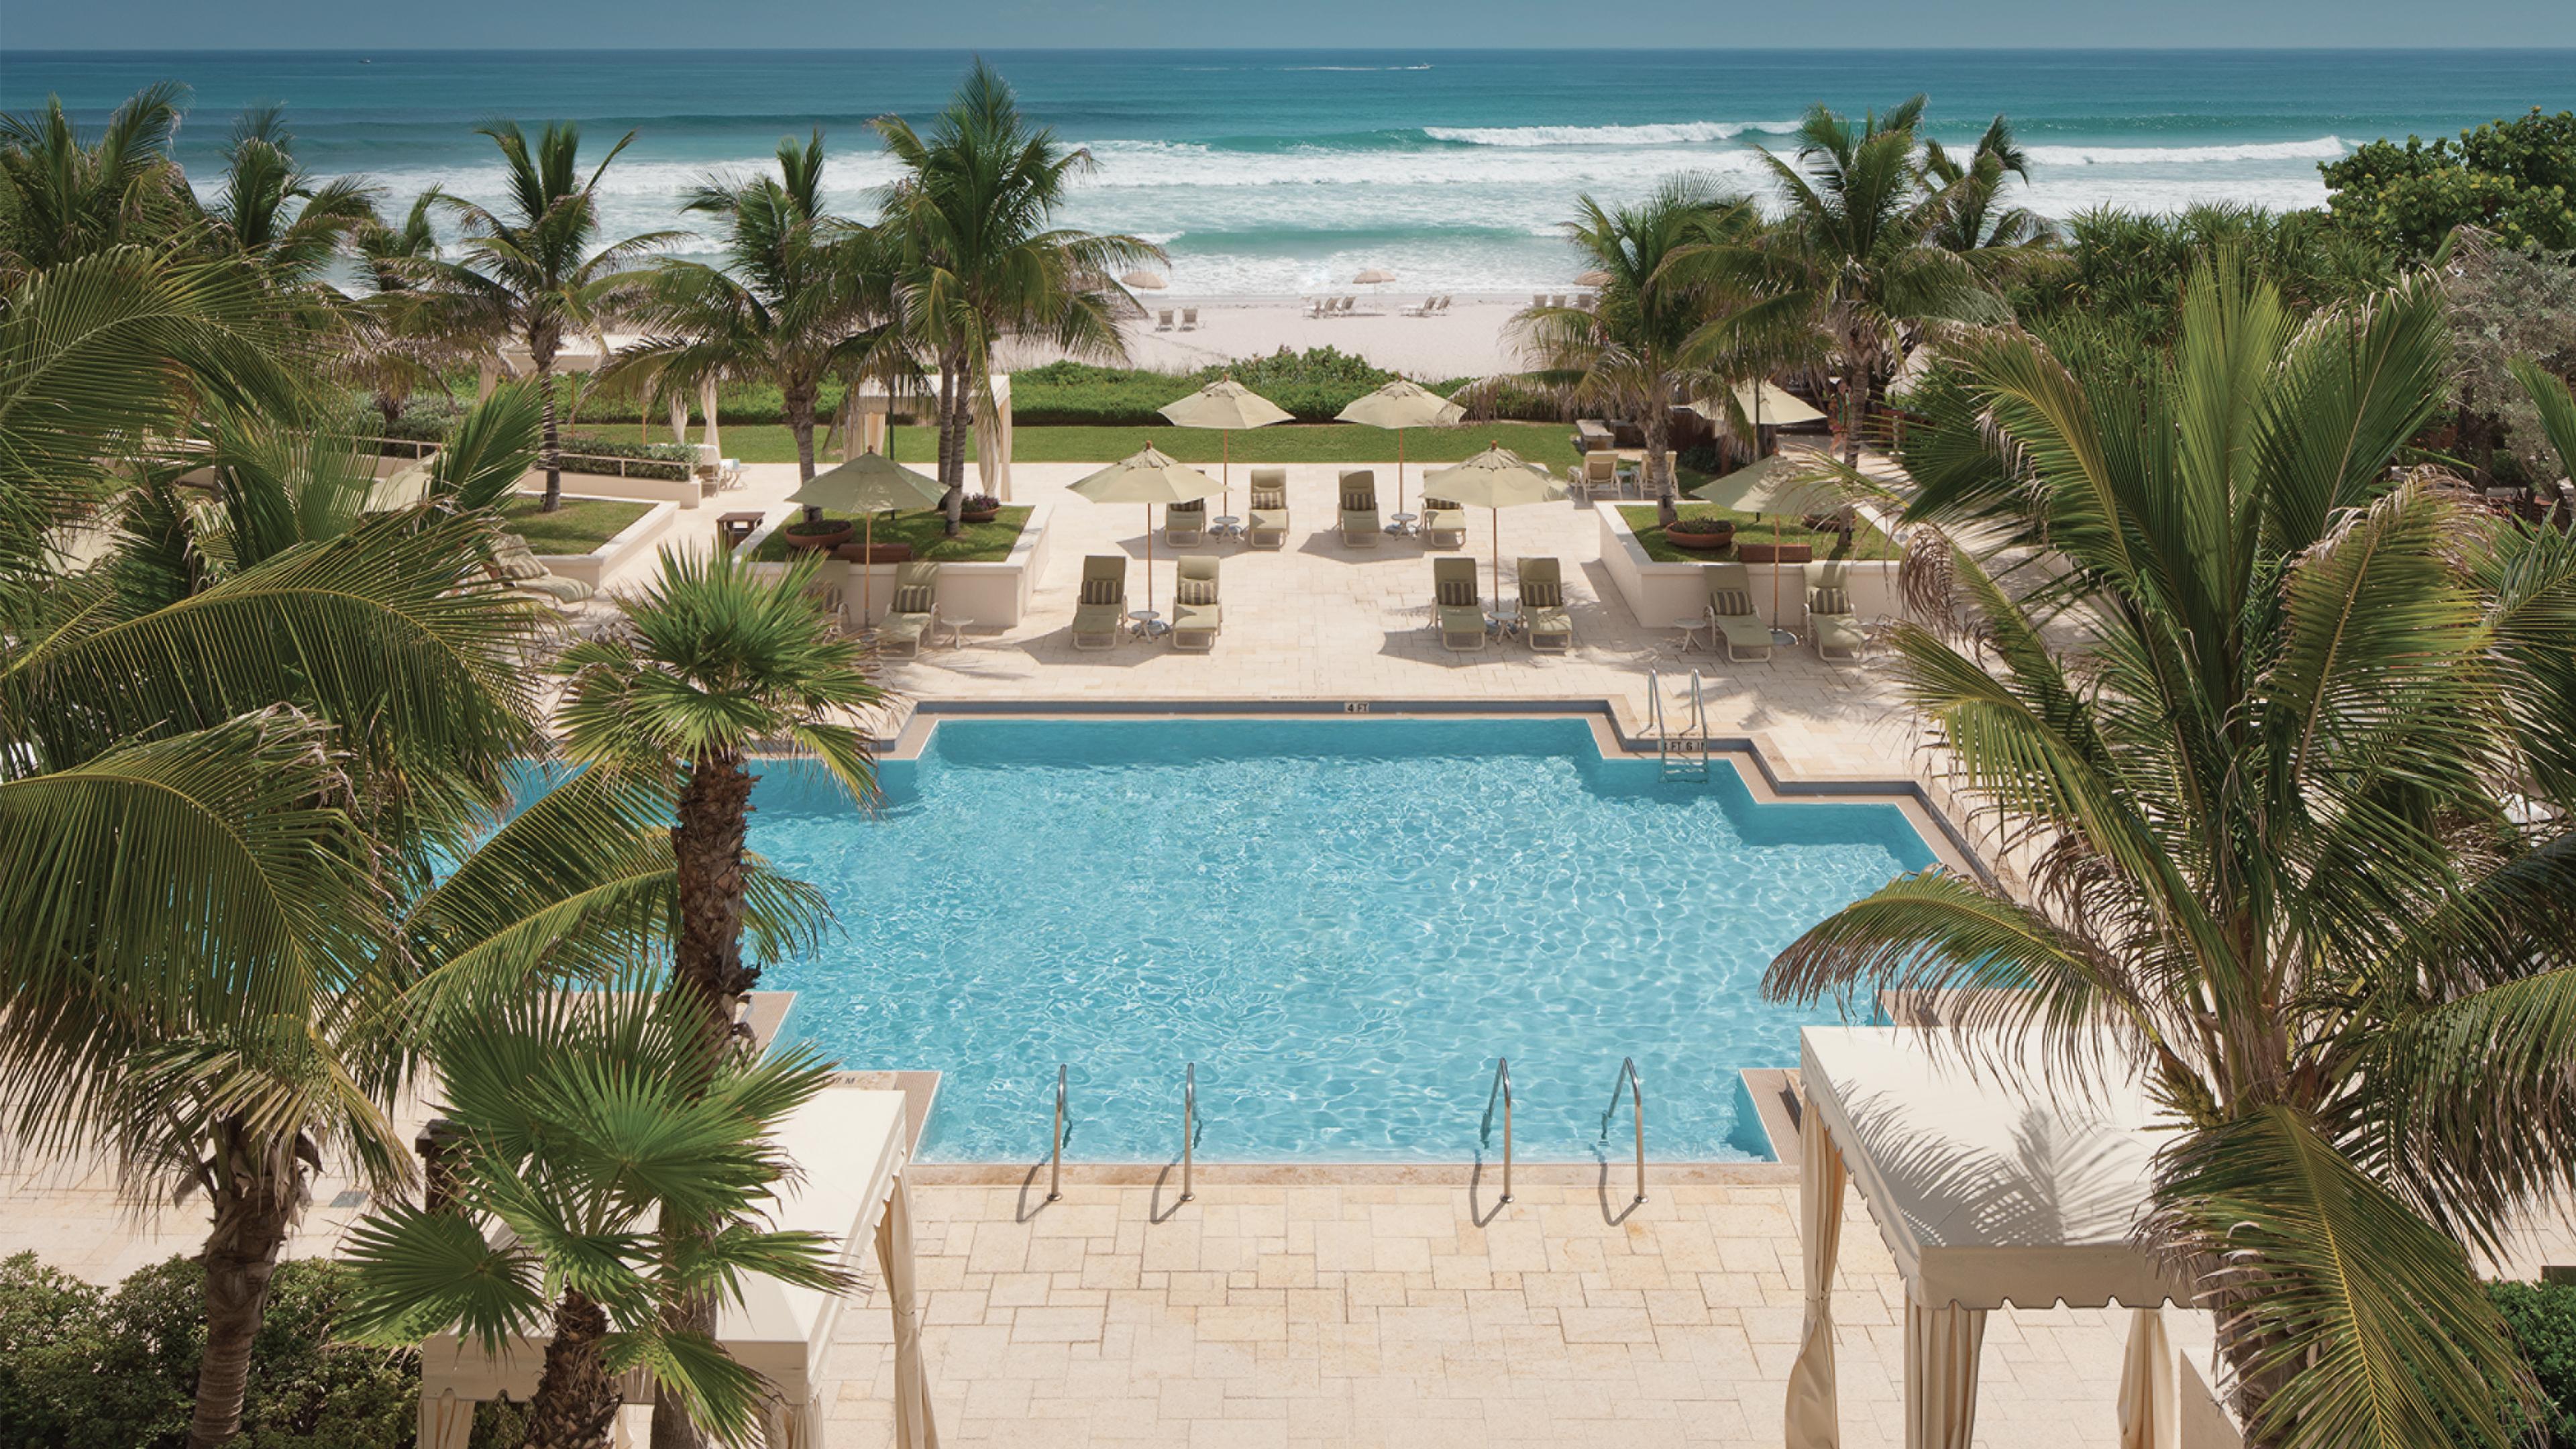 palm beach restaurants fine dining four seasons palm beach